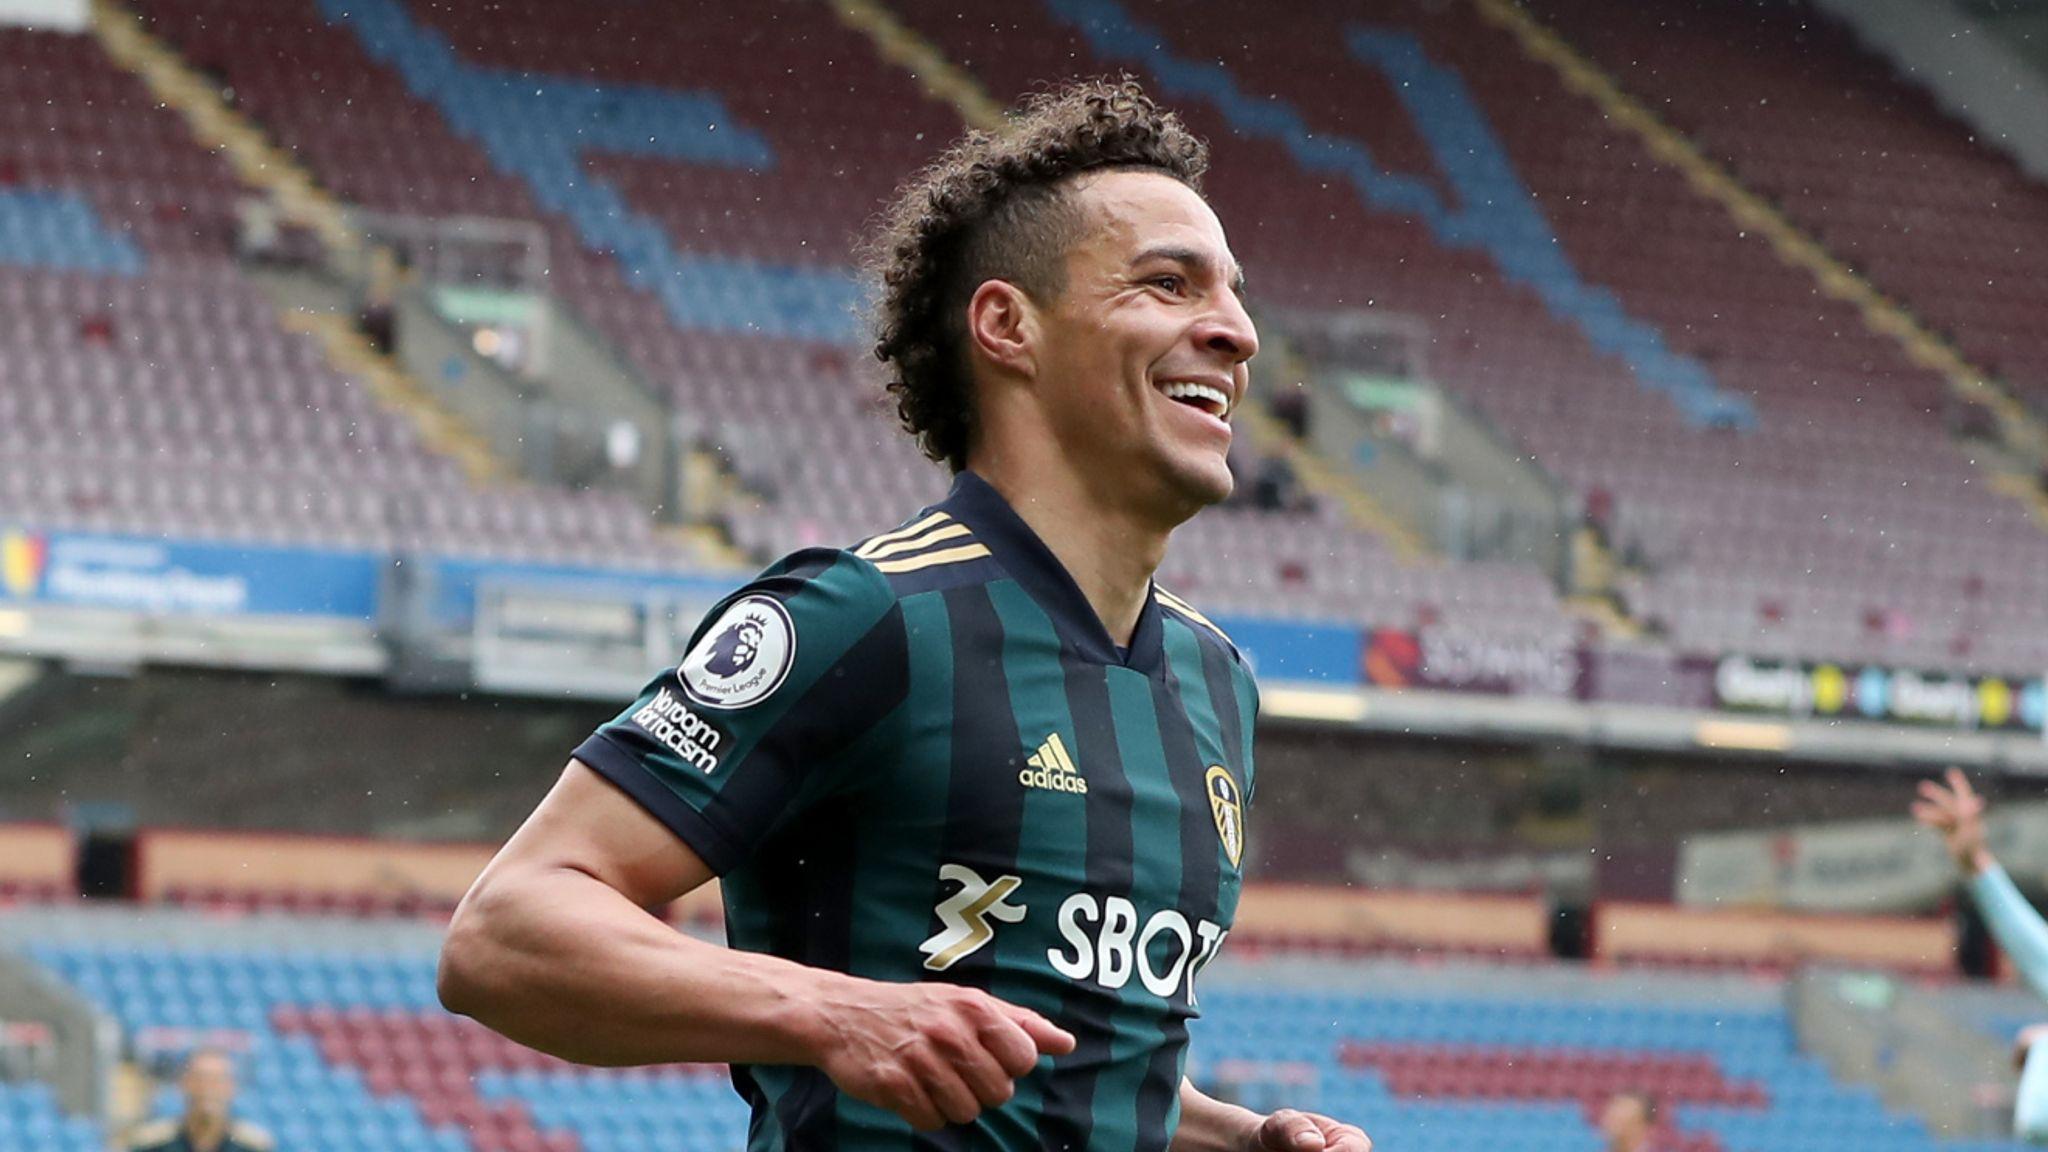 Burnley 0-4 Leeds: Super-sub Rodrigo's late double gives Marcelo Bielsa's  side big win at Turf Moor | Football News | Sky Sports